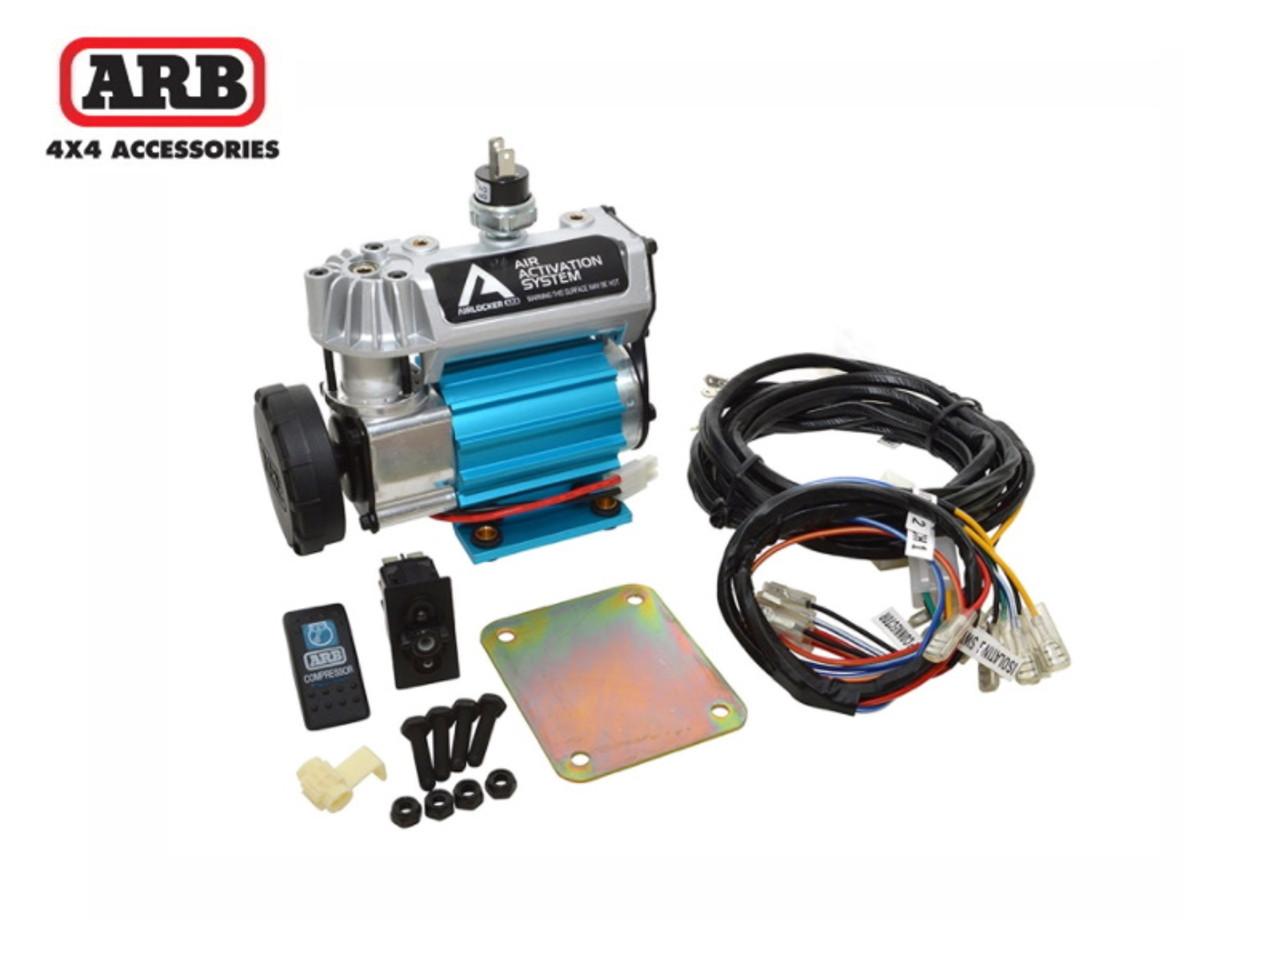 ARB Compact On Board 12v Compressor Assembly - DA4958- CKSA12